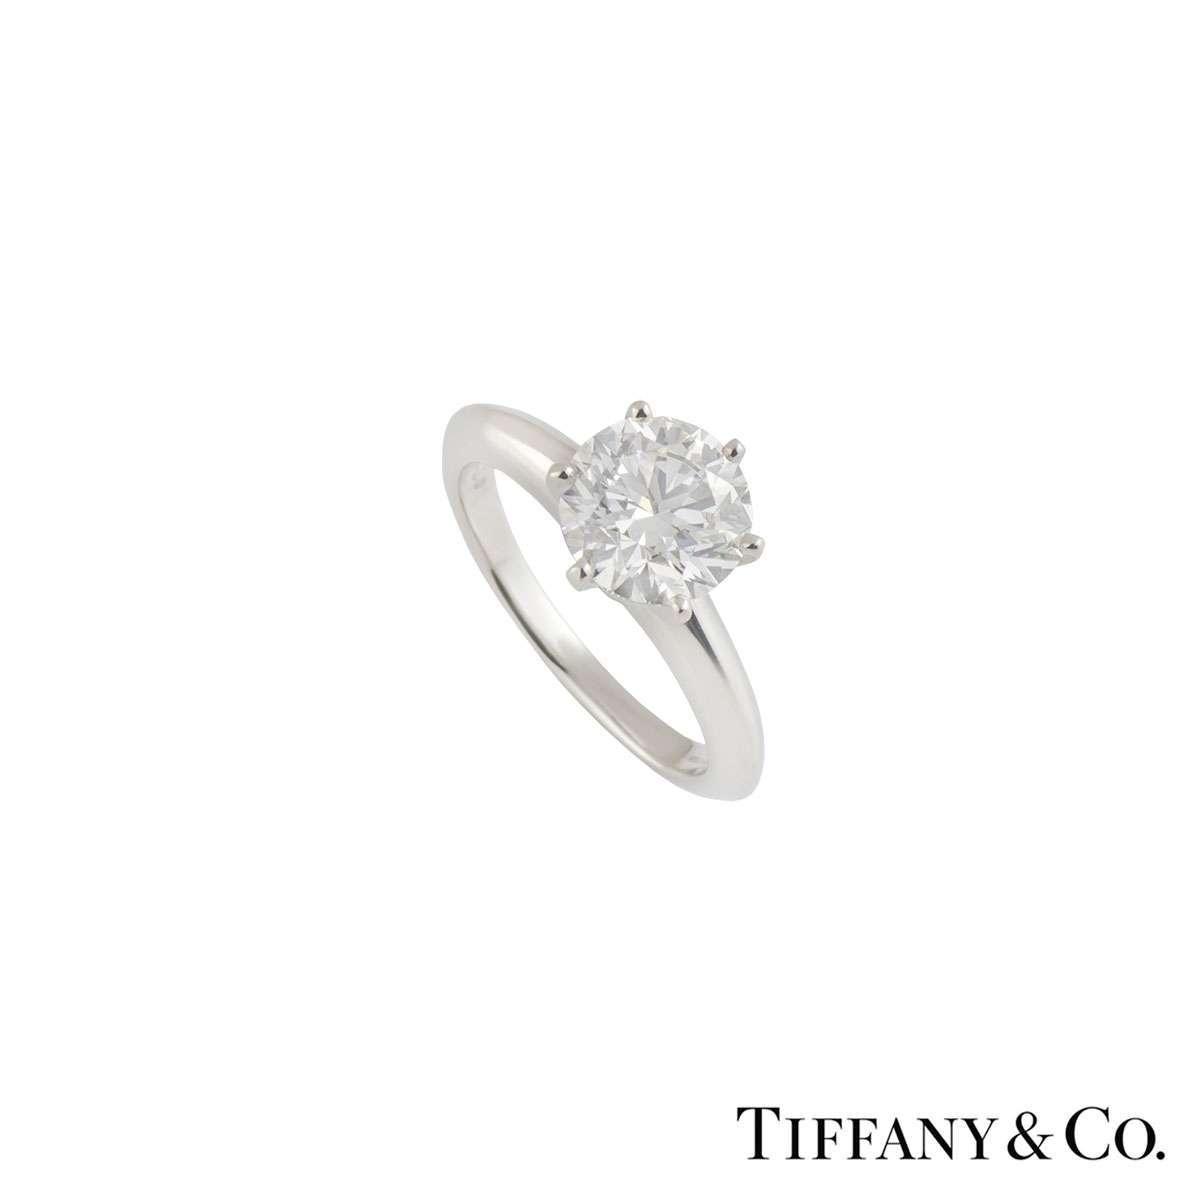 Tiffany & Co. Platinum Diamond Setting Band Ring 1.79ct H/VS2 XXX